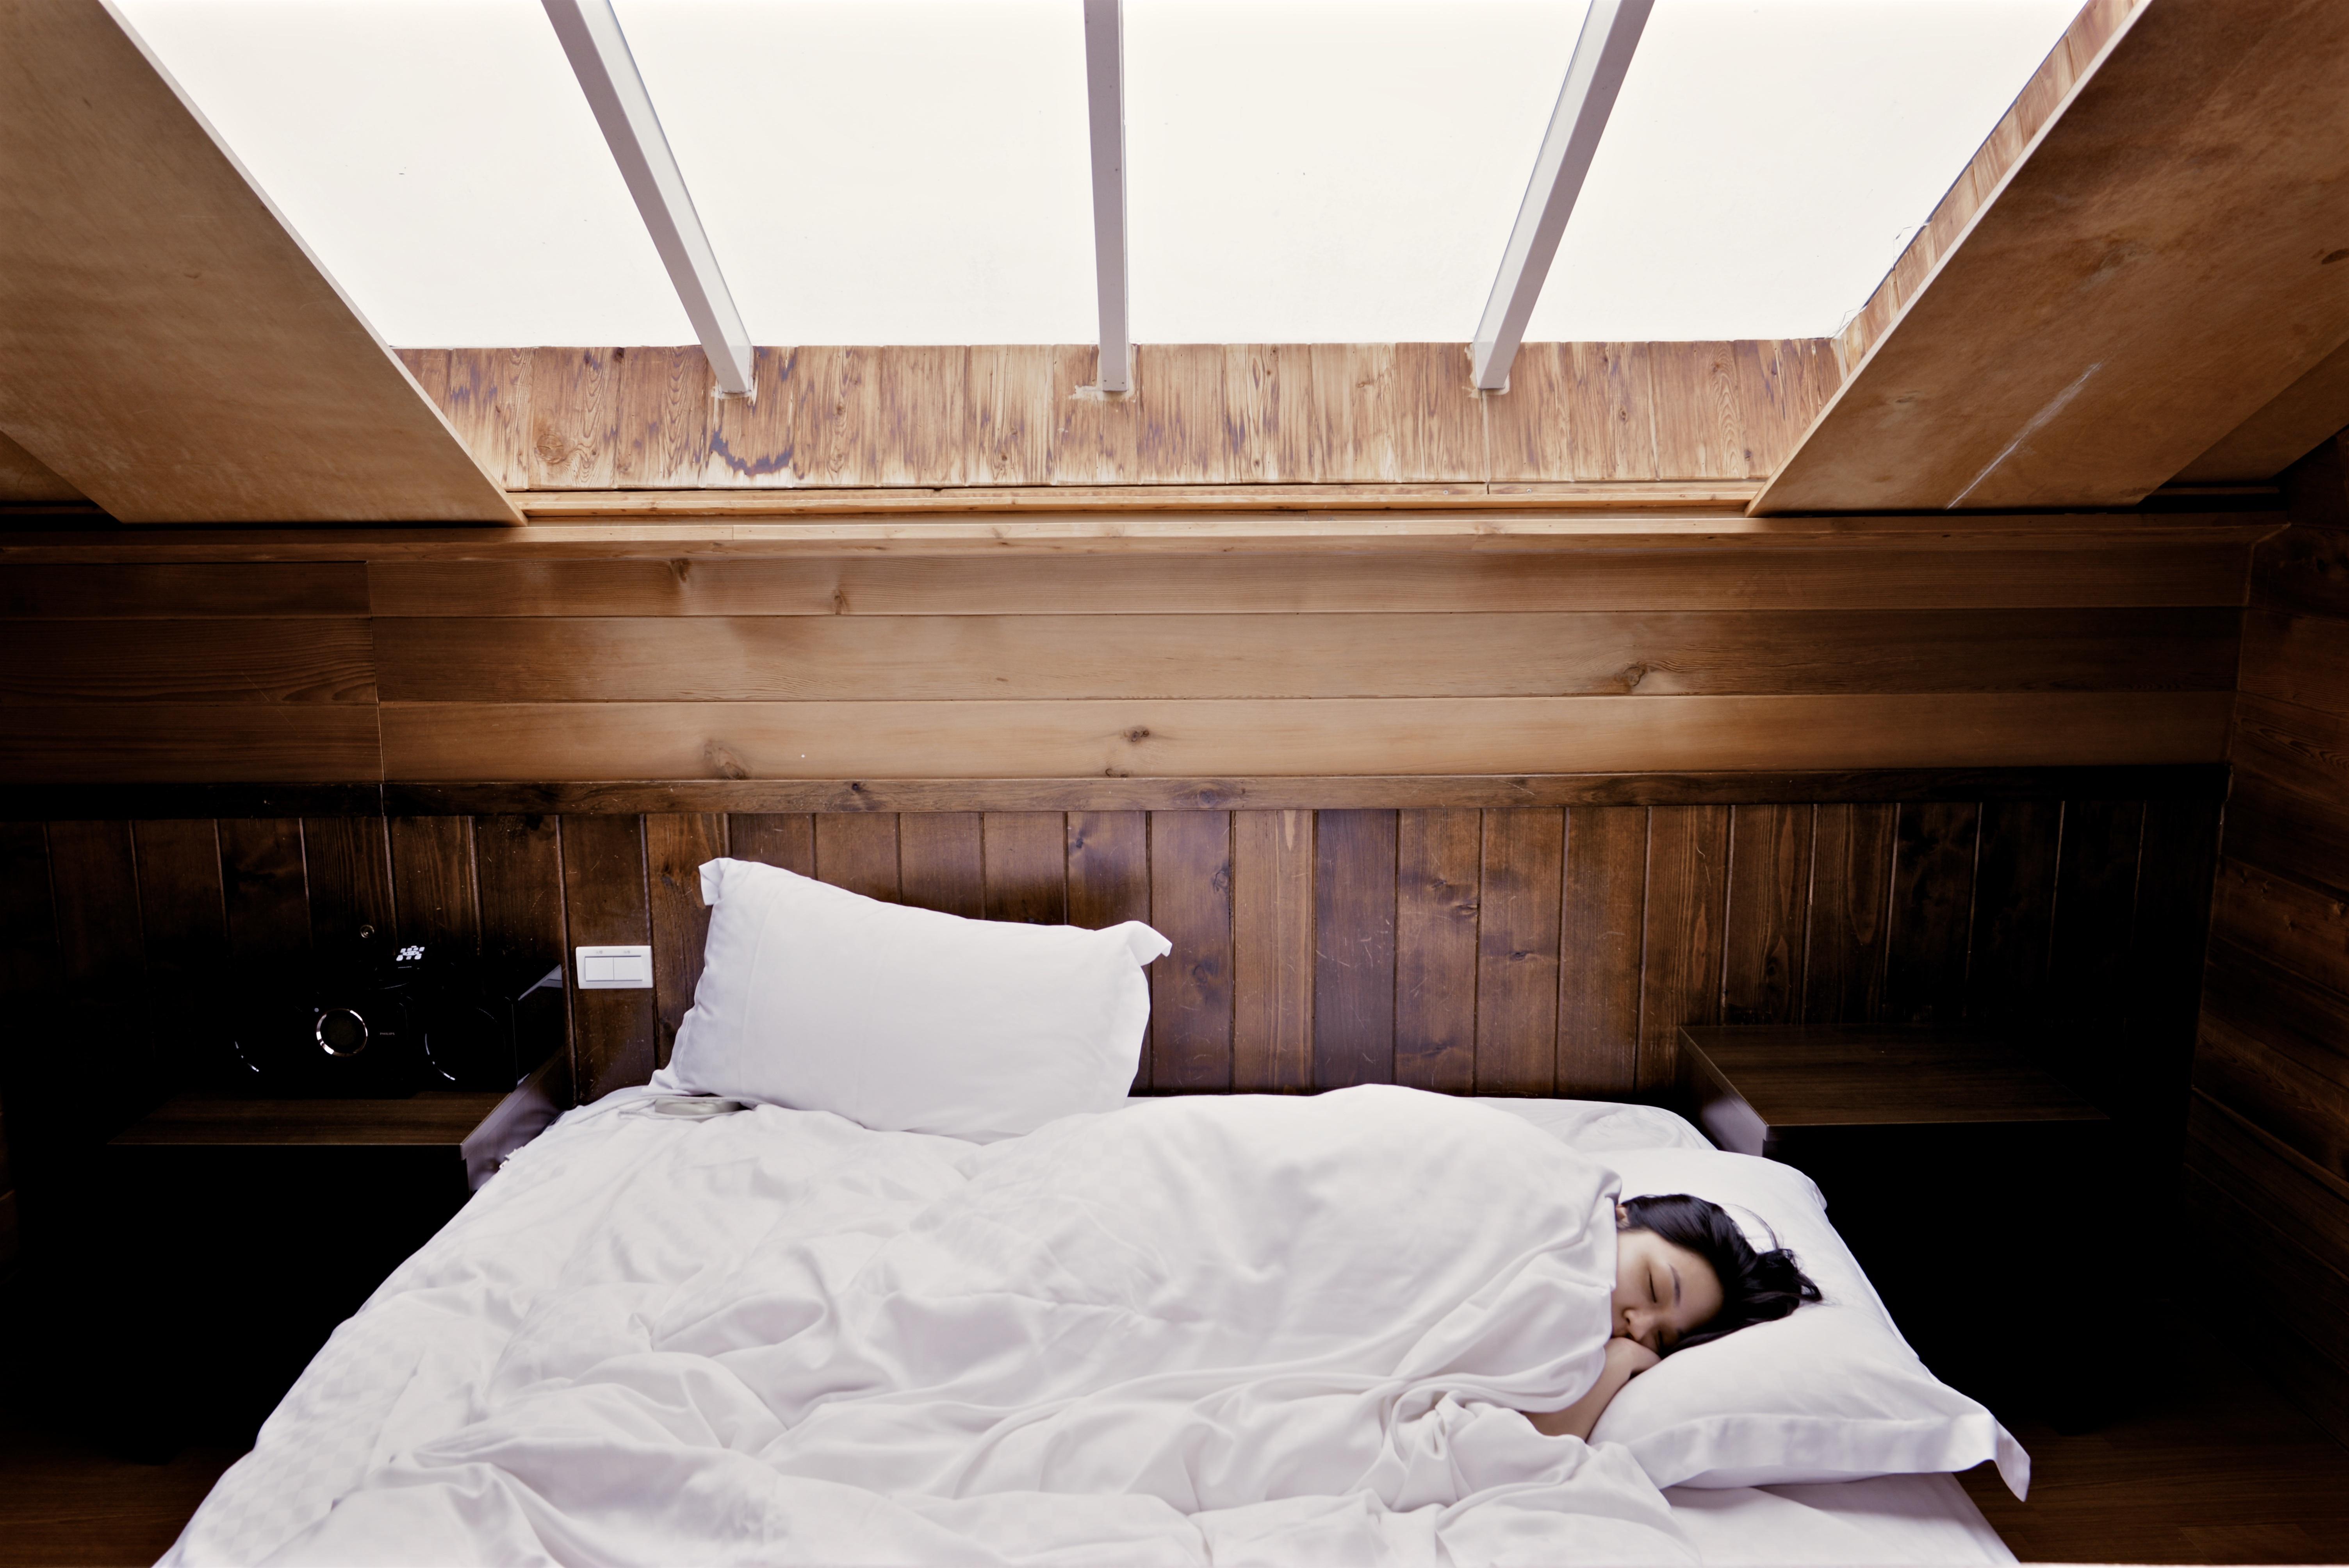 Free images wood floor cottage furniture room for Sleeping room interior design